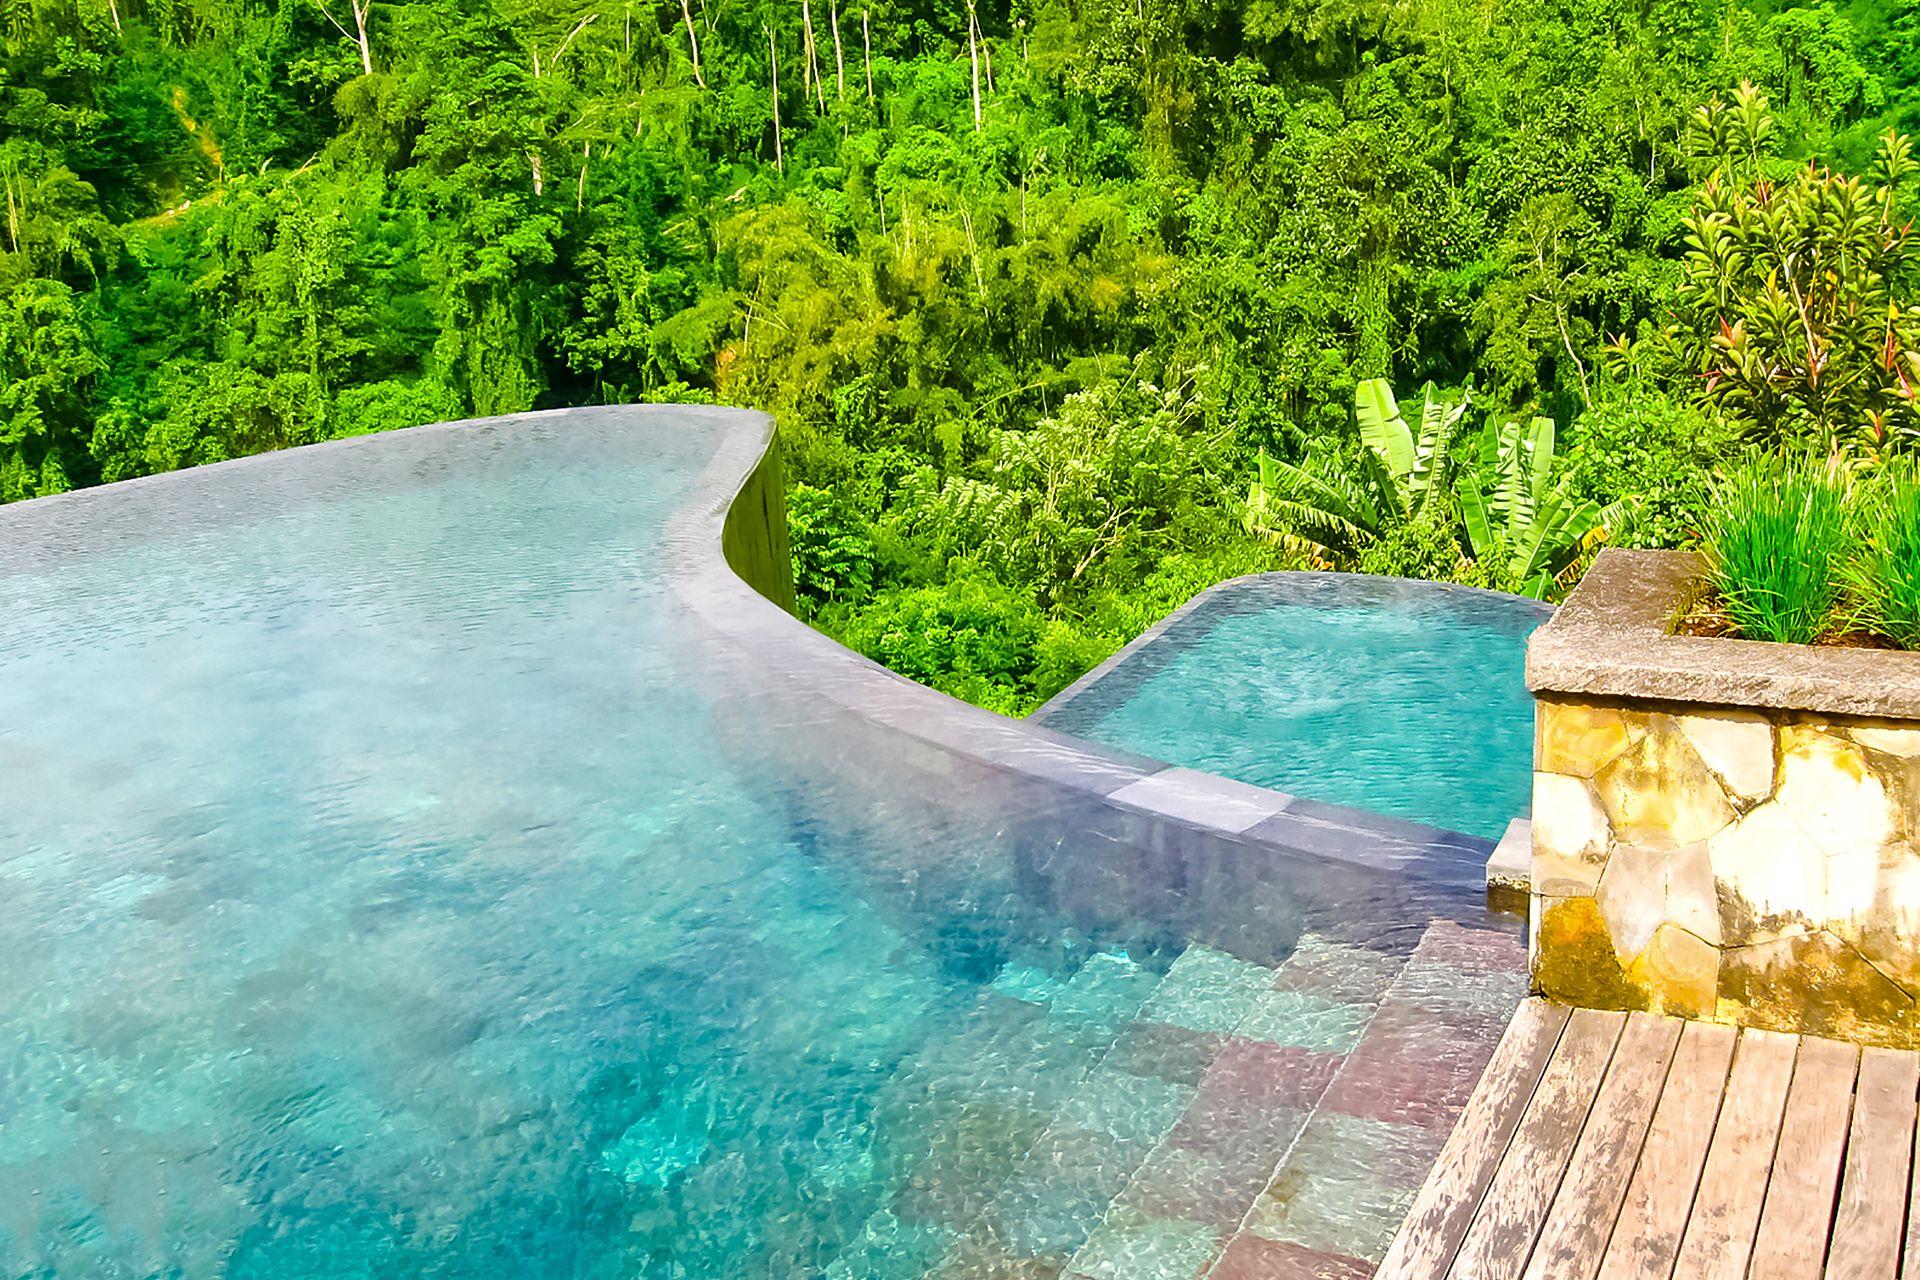 Vasche pensili a Bali